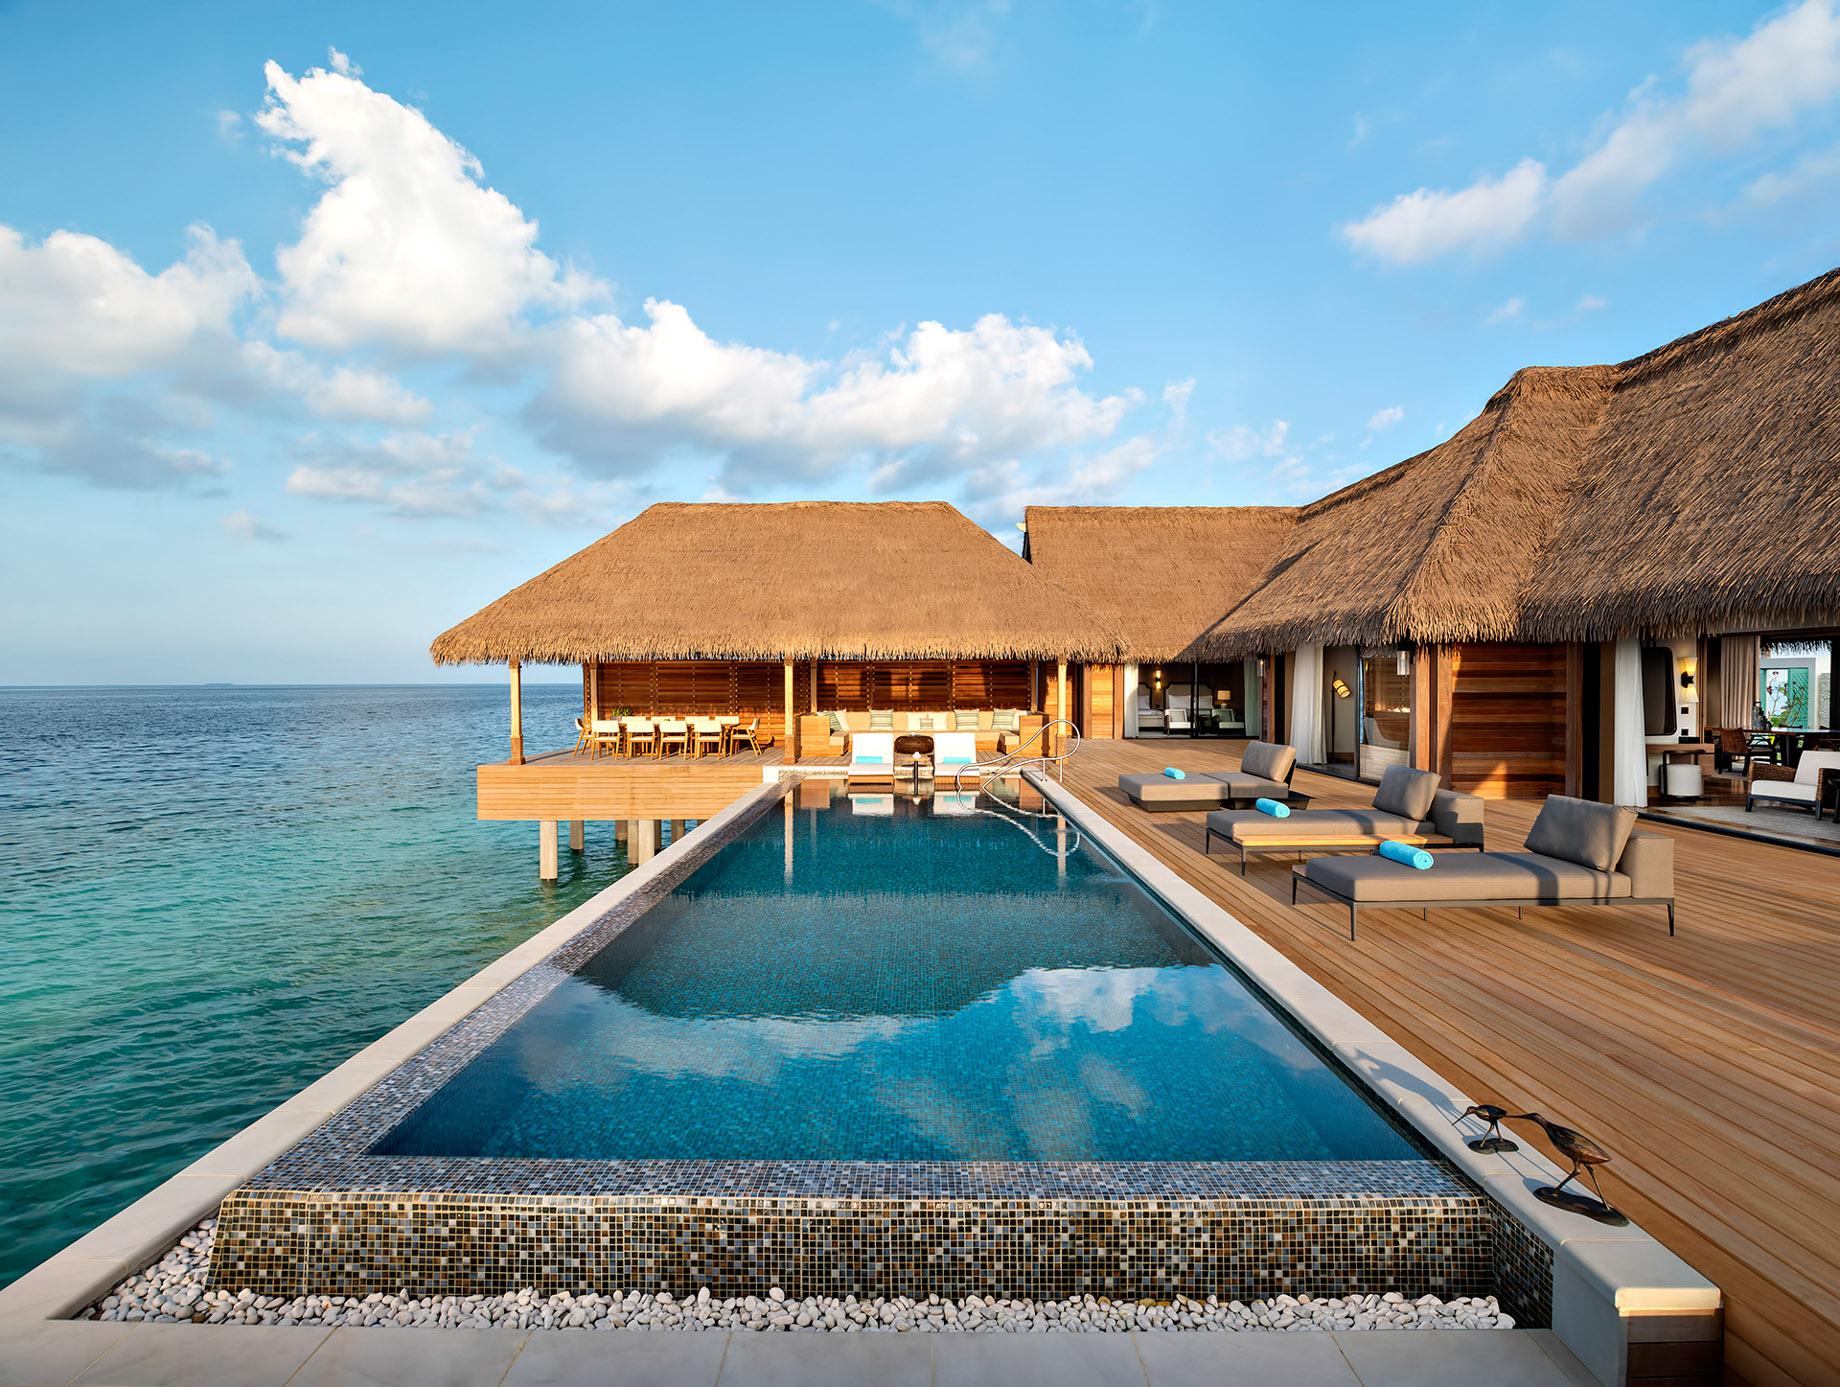 Waldorf Astoria Maldives Ithaafushi Luxury Resort – Ithaafushi Island, Maldives – Two and Three Bedroom Overwater Villa Infinity Pool